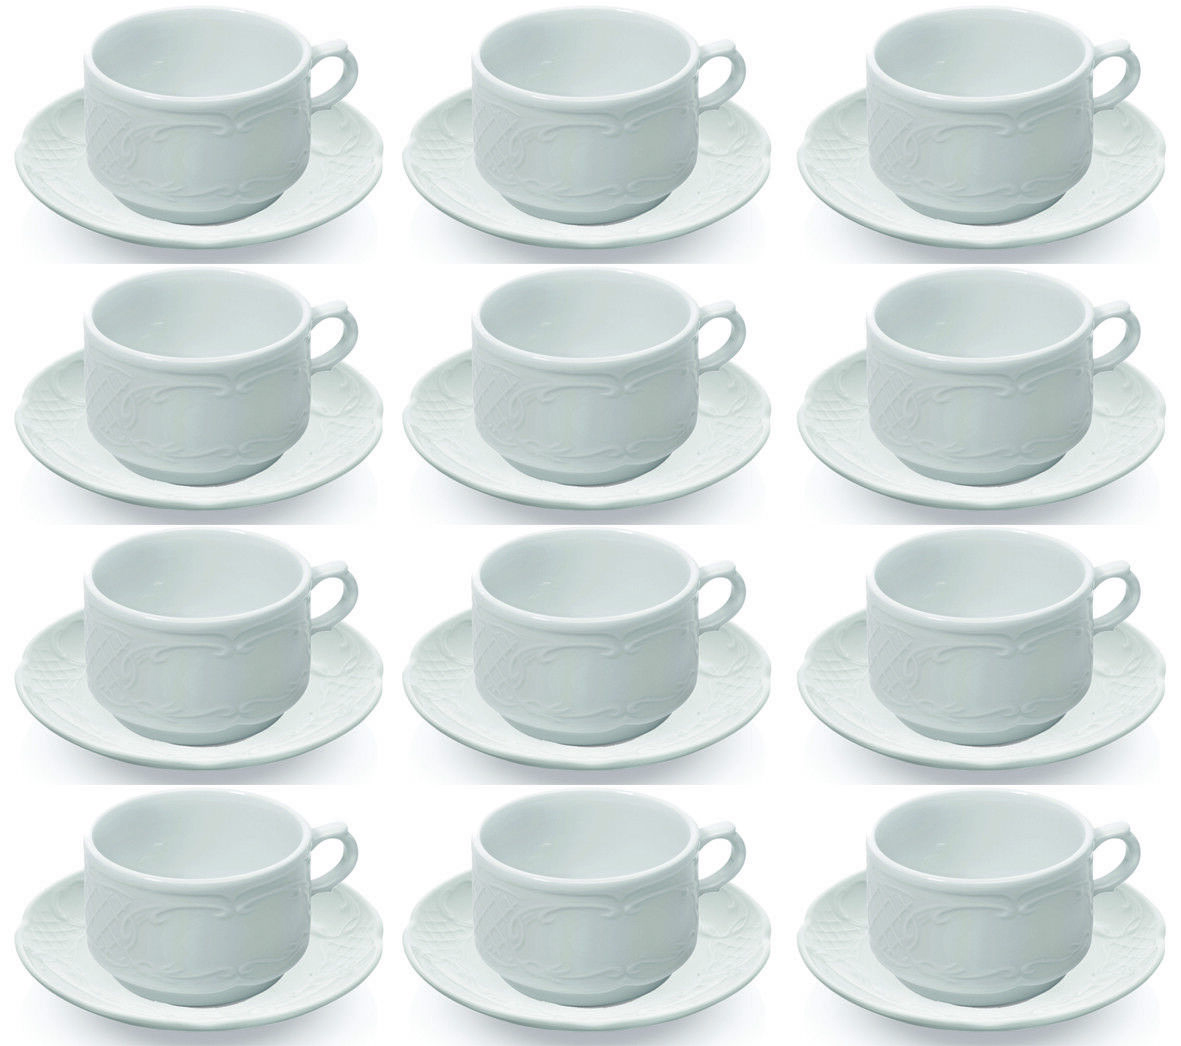 12x Cappuccino Set, Cappuccino, Cappuccino Tasse, 0,22 l, Porcelaine Blanc